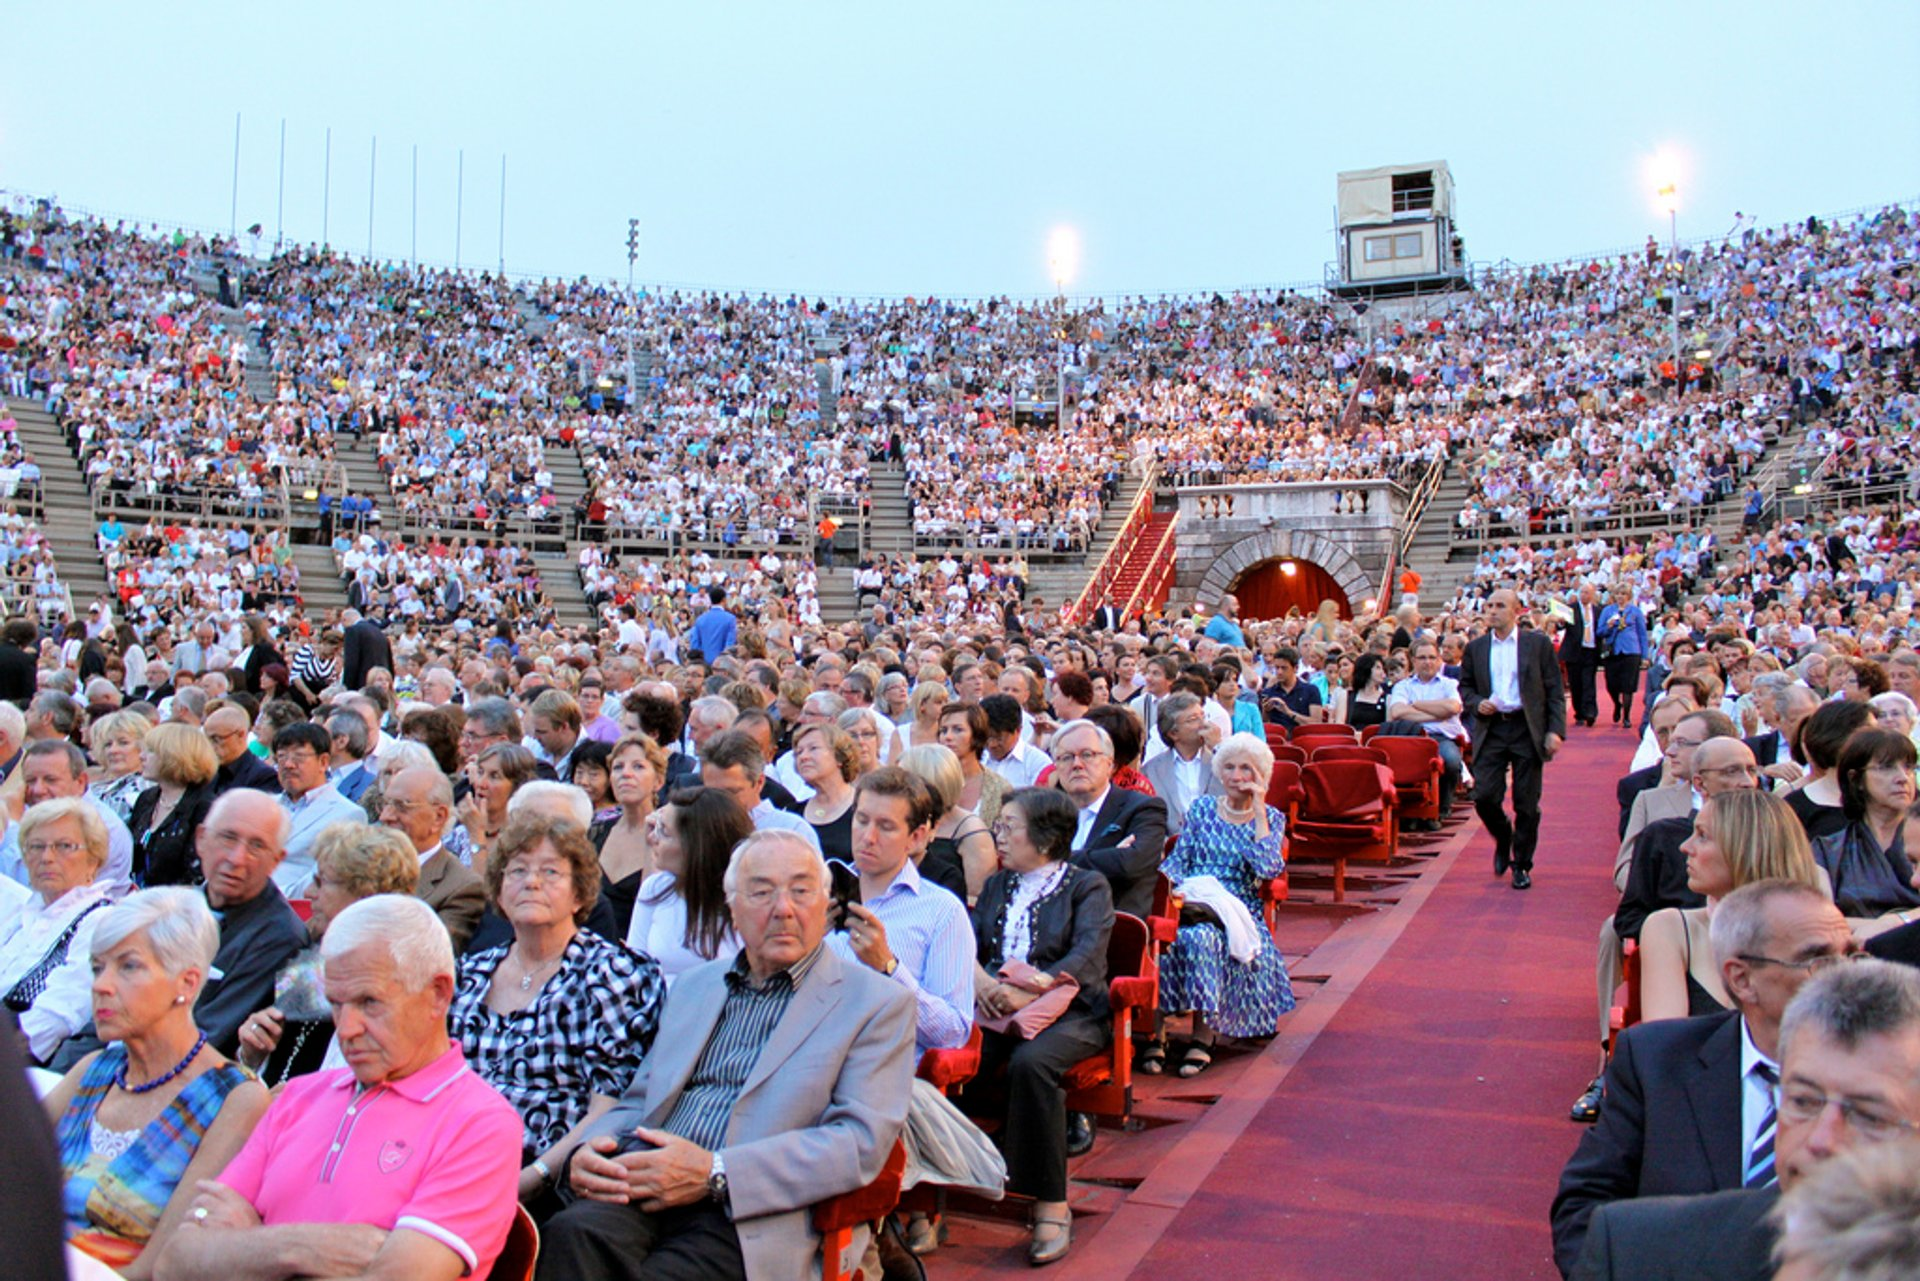 Arena di Verona Opera Festival in Italy 2019 - Best Time